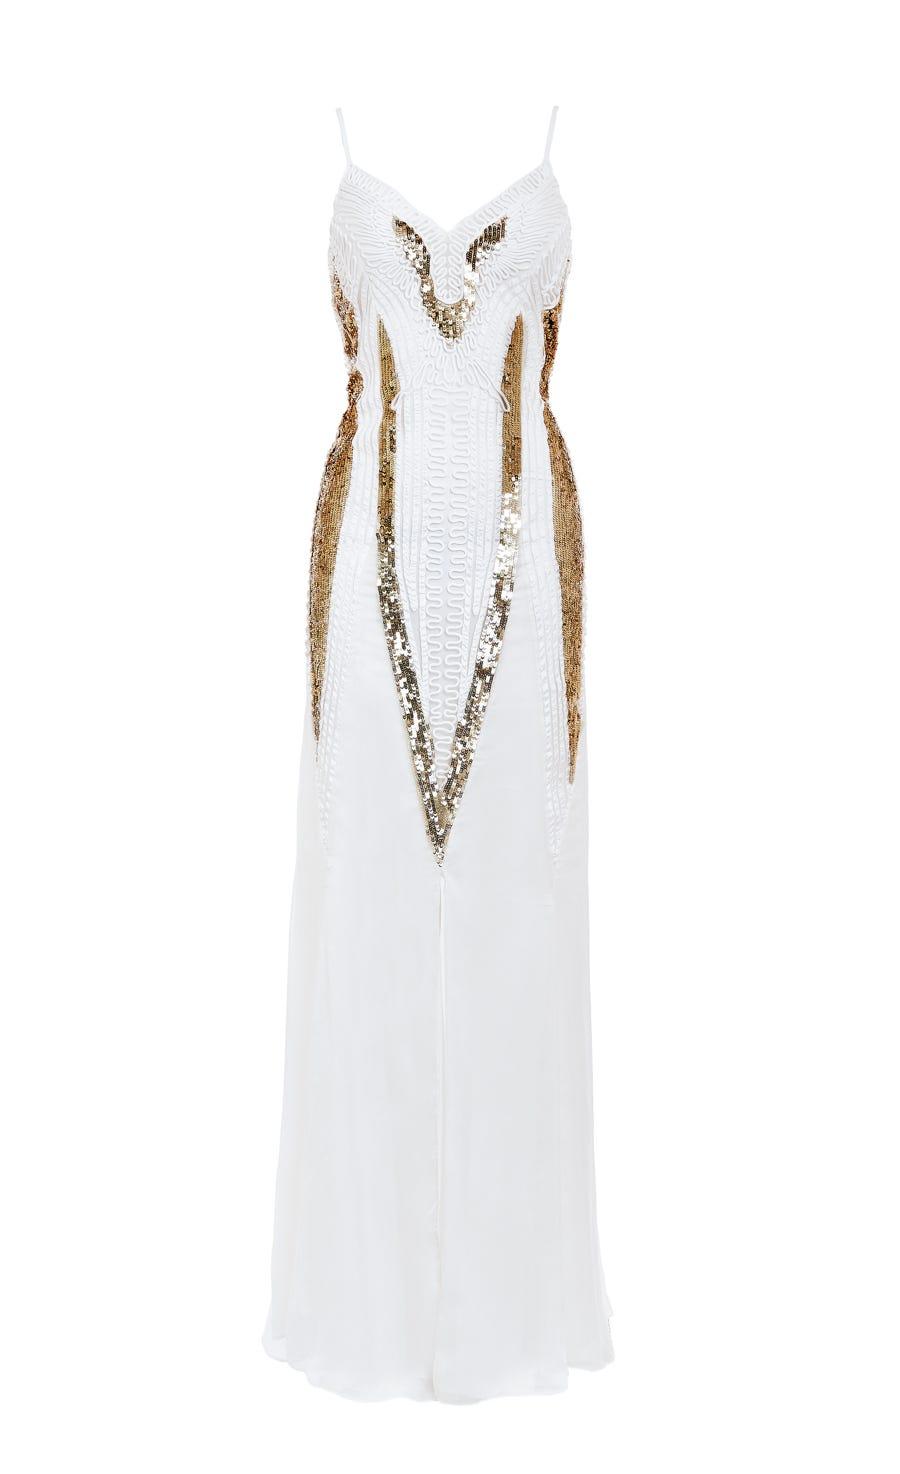 Moondrop Long Dress